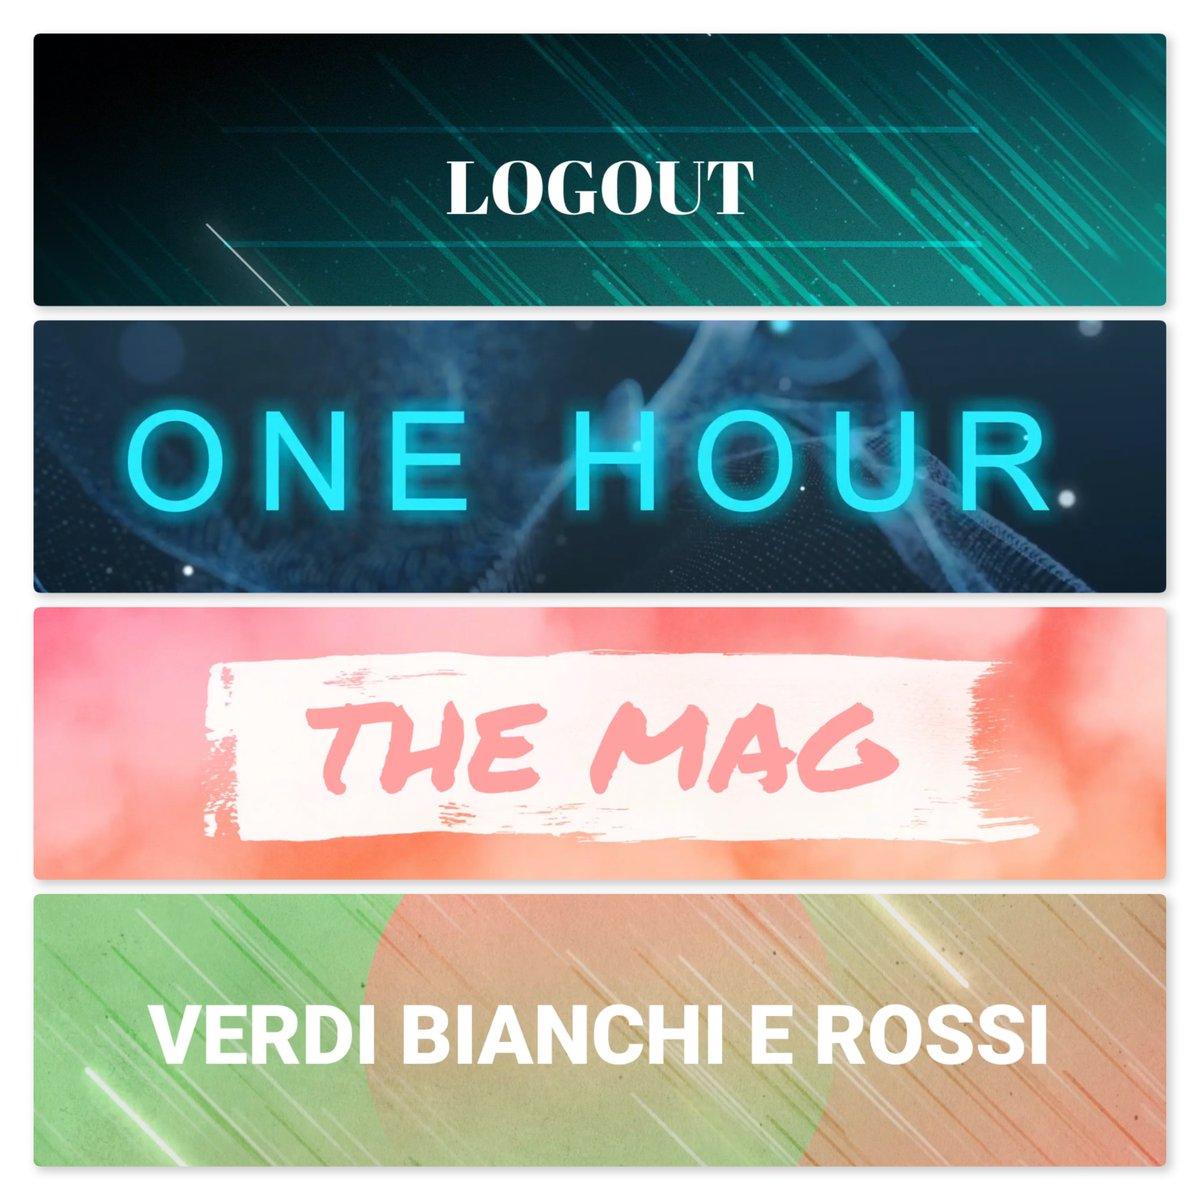 Pronti ad iniziare una nuova giornata insieme?  Dalle 8:00: LOGOUT - VERDI BIANCHI ROSSI - ONE HOUR - THE MAG  https://t.co/dJEnzBhCbl #radiofm #radiofmfaleria #artiste #beat #beats #bestsong #bumpin #love #TFLers #tweegram https://t.co/CUG7M1PAlM